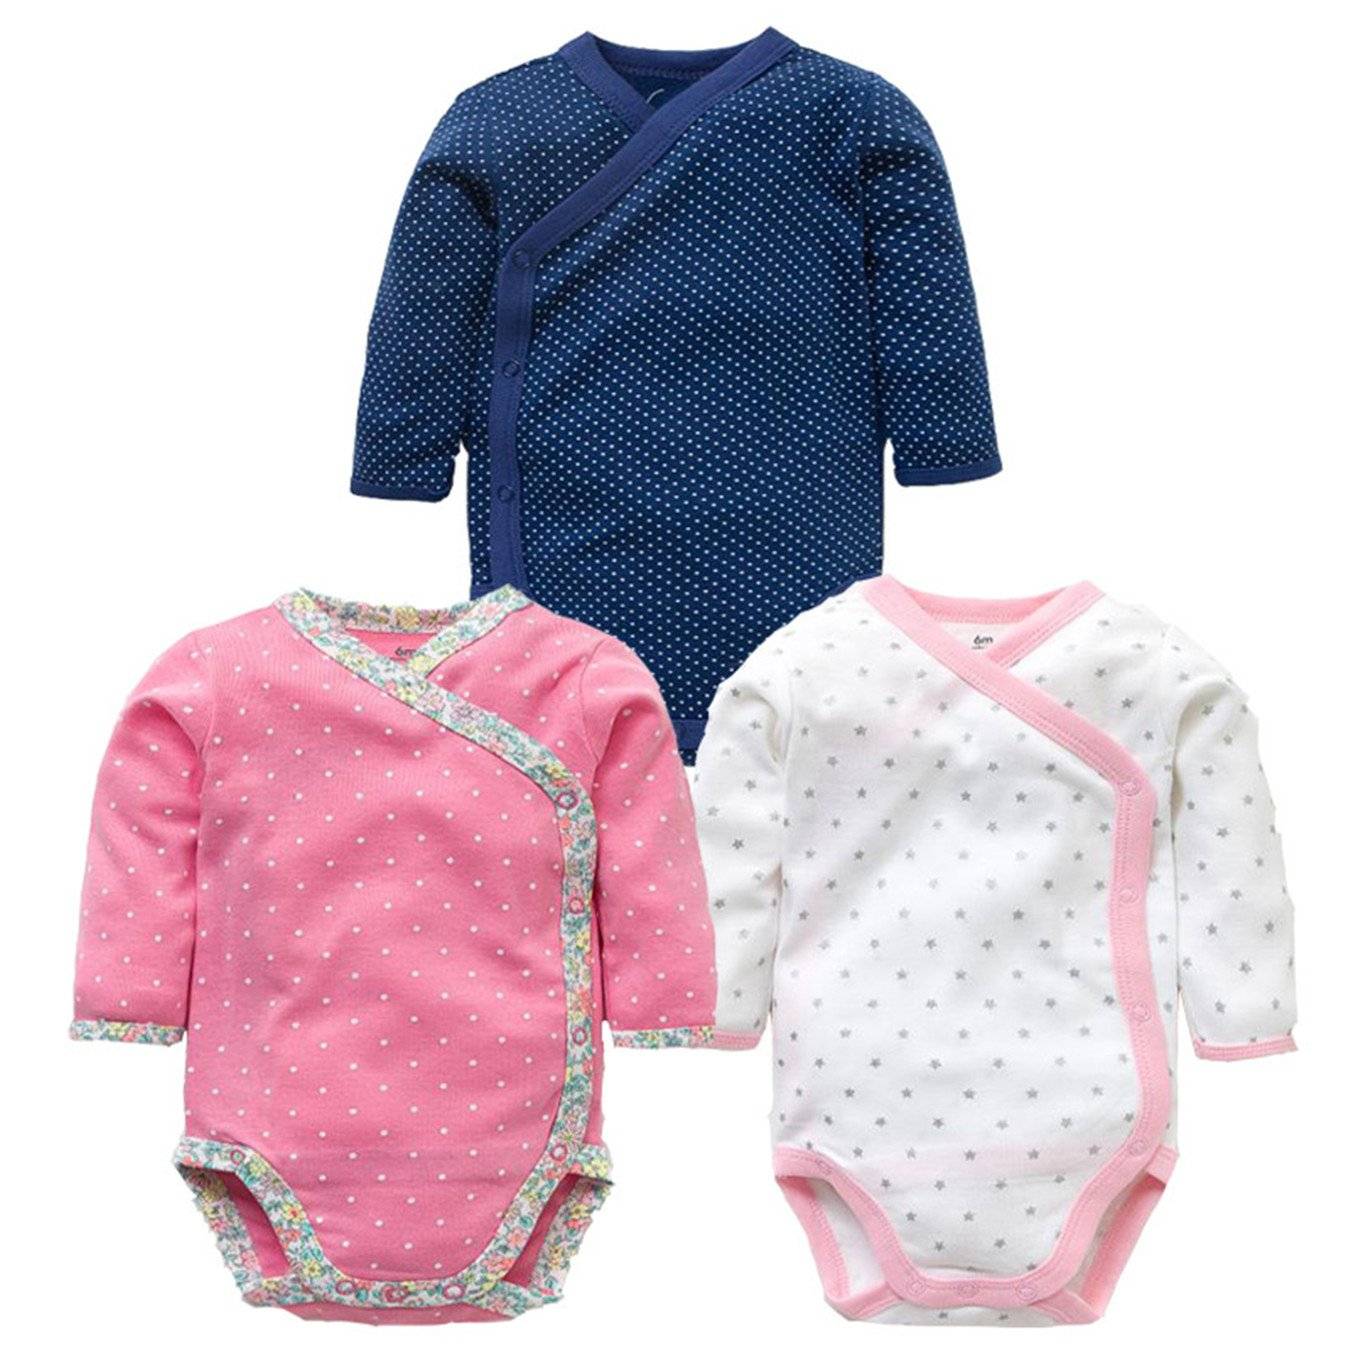 3 Pcs Baby Romper Long Sleeves Cotton Newborn Baby Girl Boy Clothes Cartoon Printed Baby Set 0-12 M